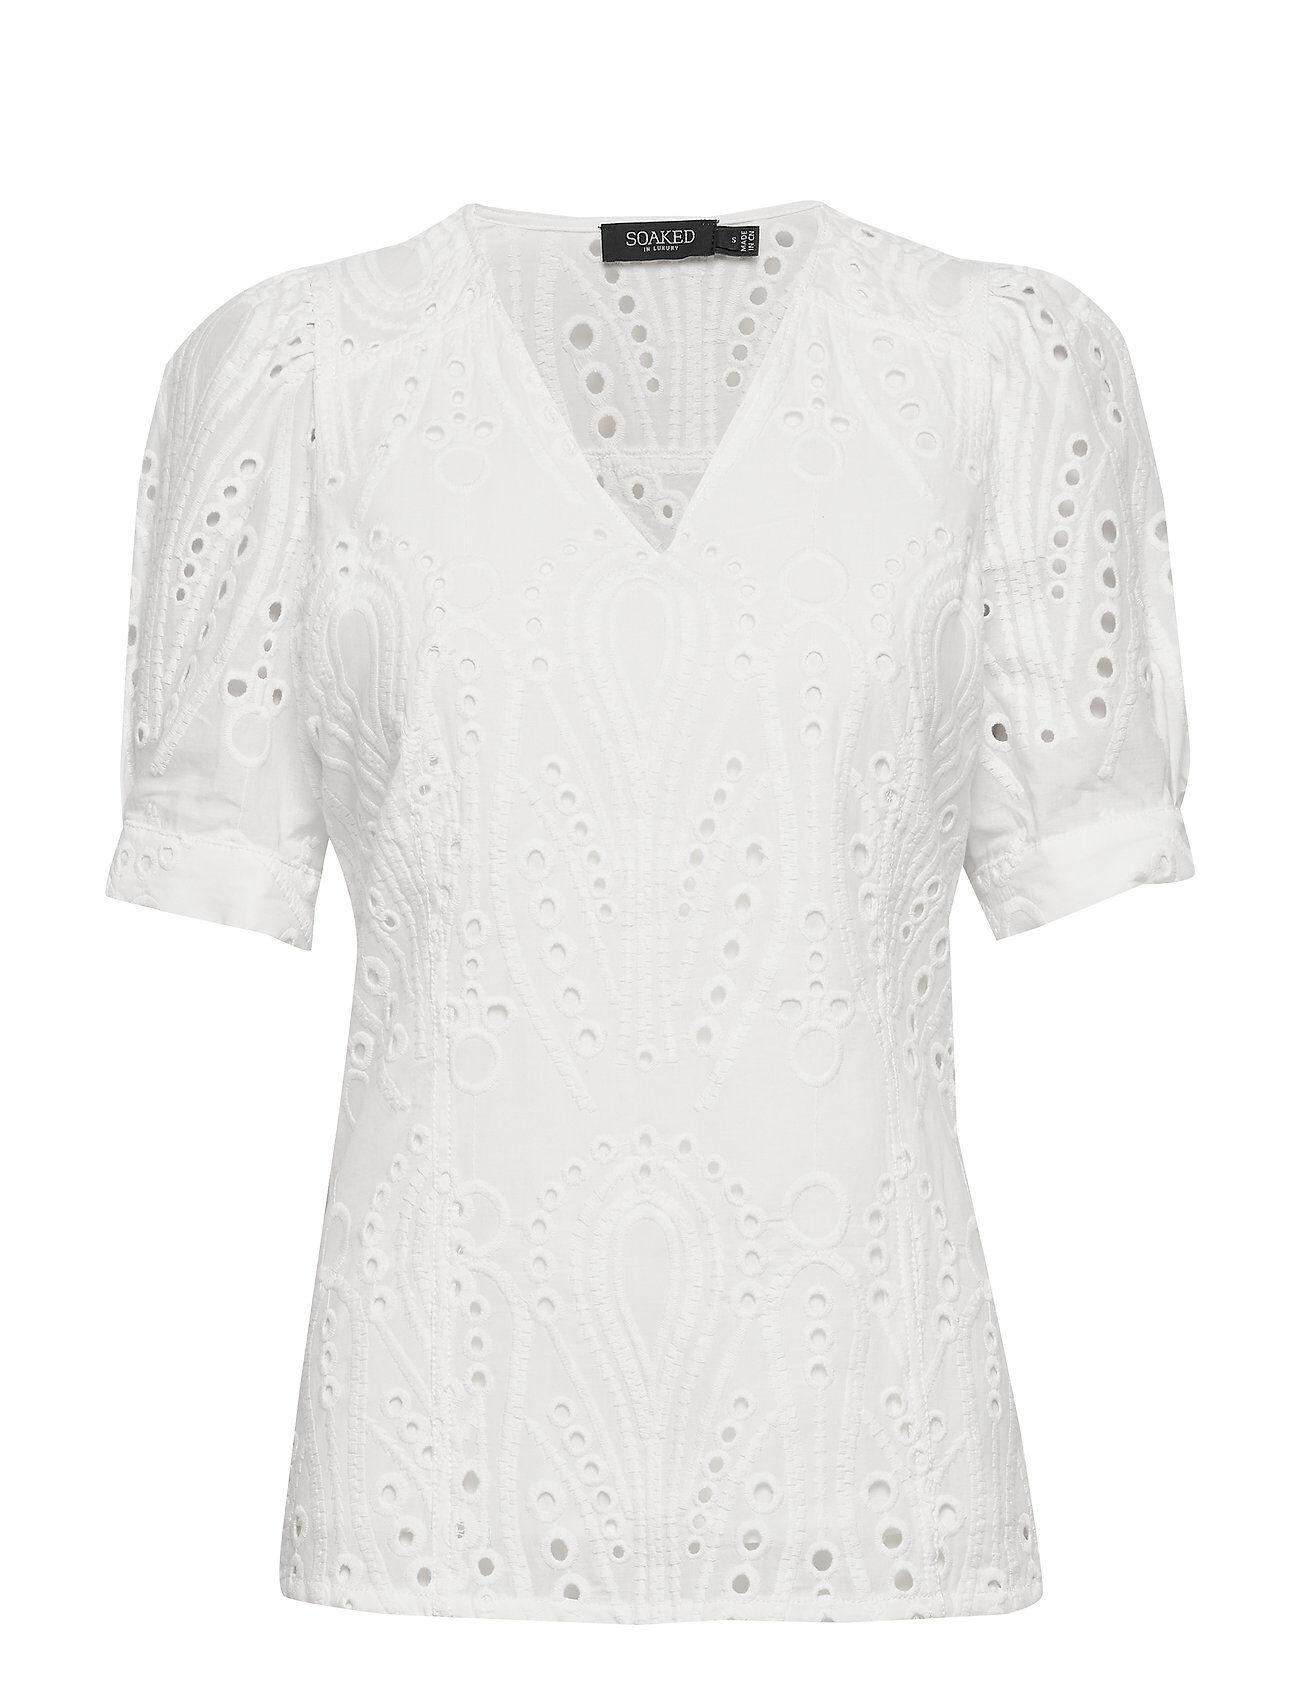 Soaked in Luxury Slnolah Top Ss Blouses Short-sleeved Valkoinen Soaked In Luxury